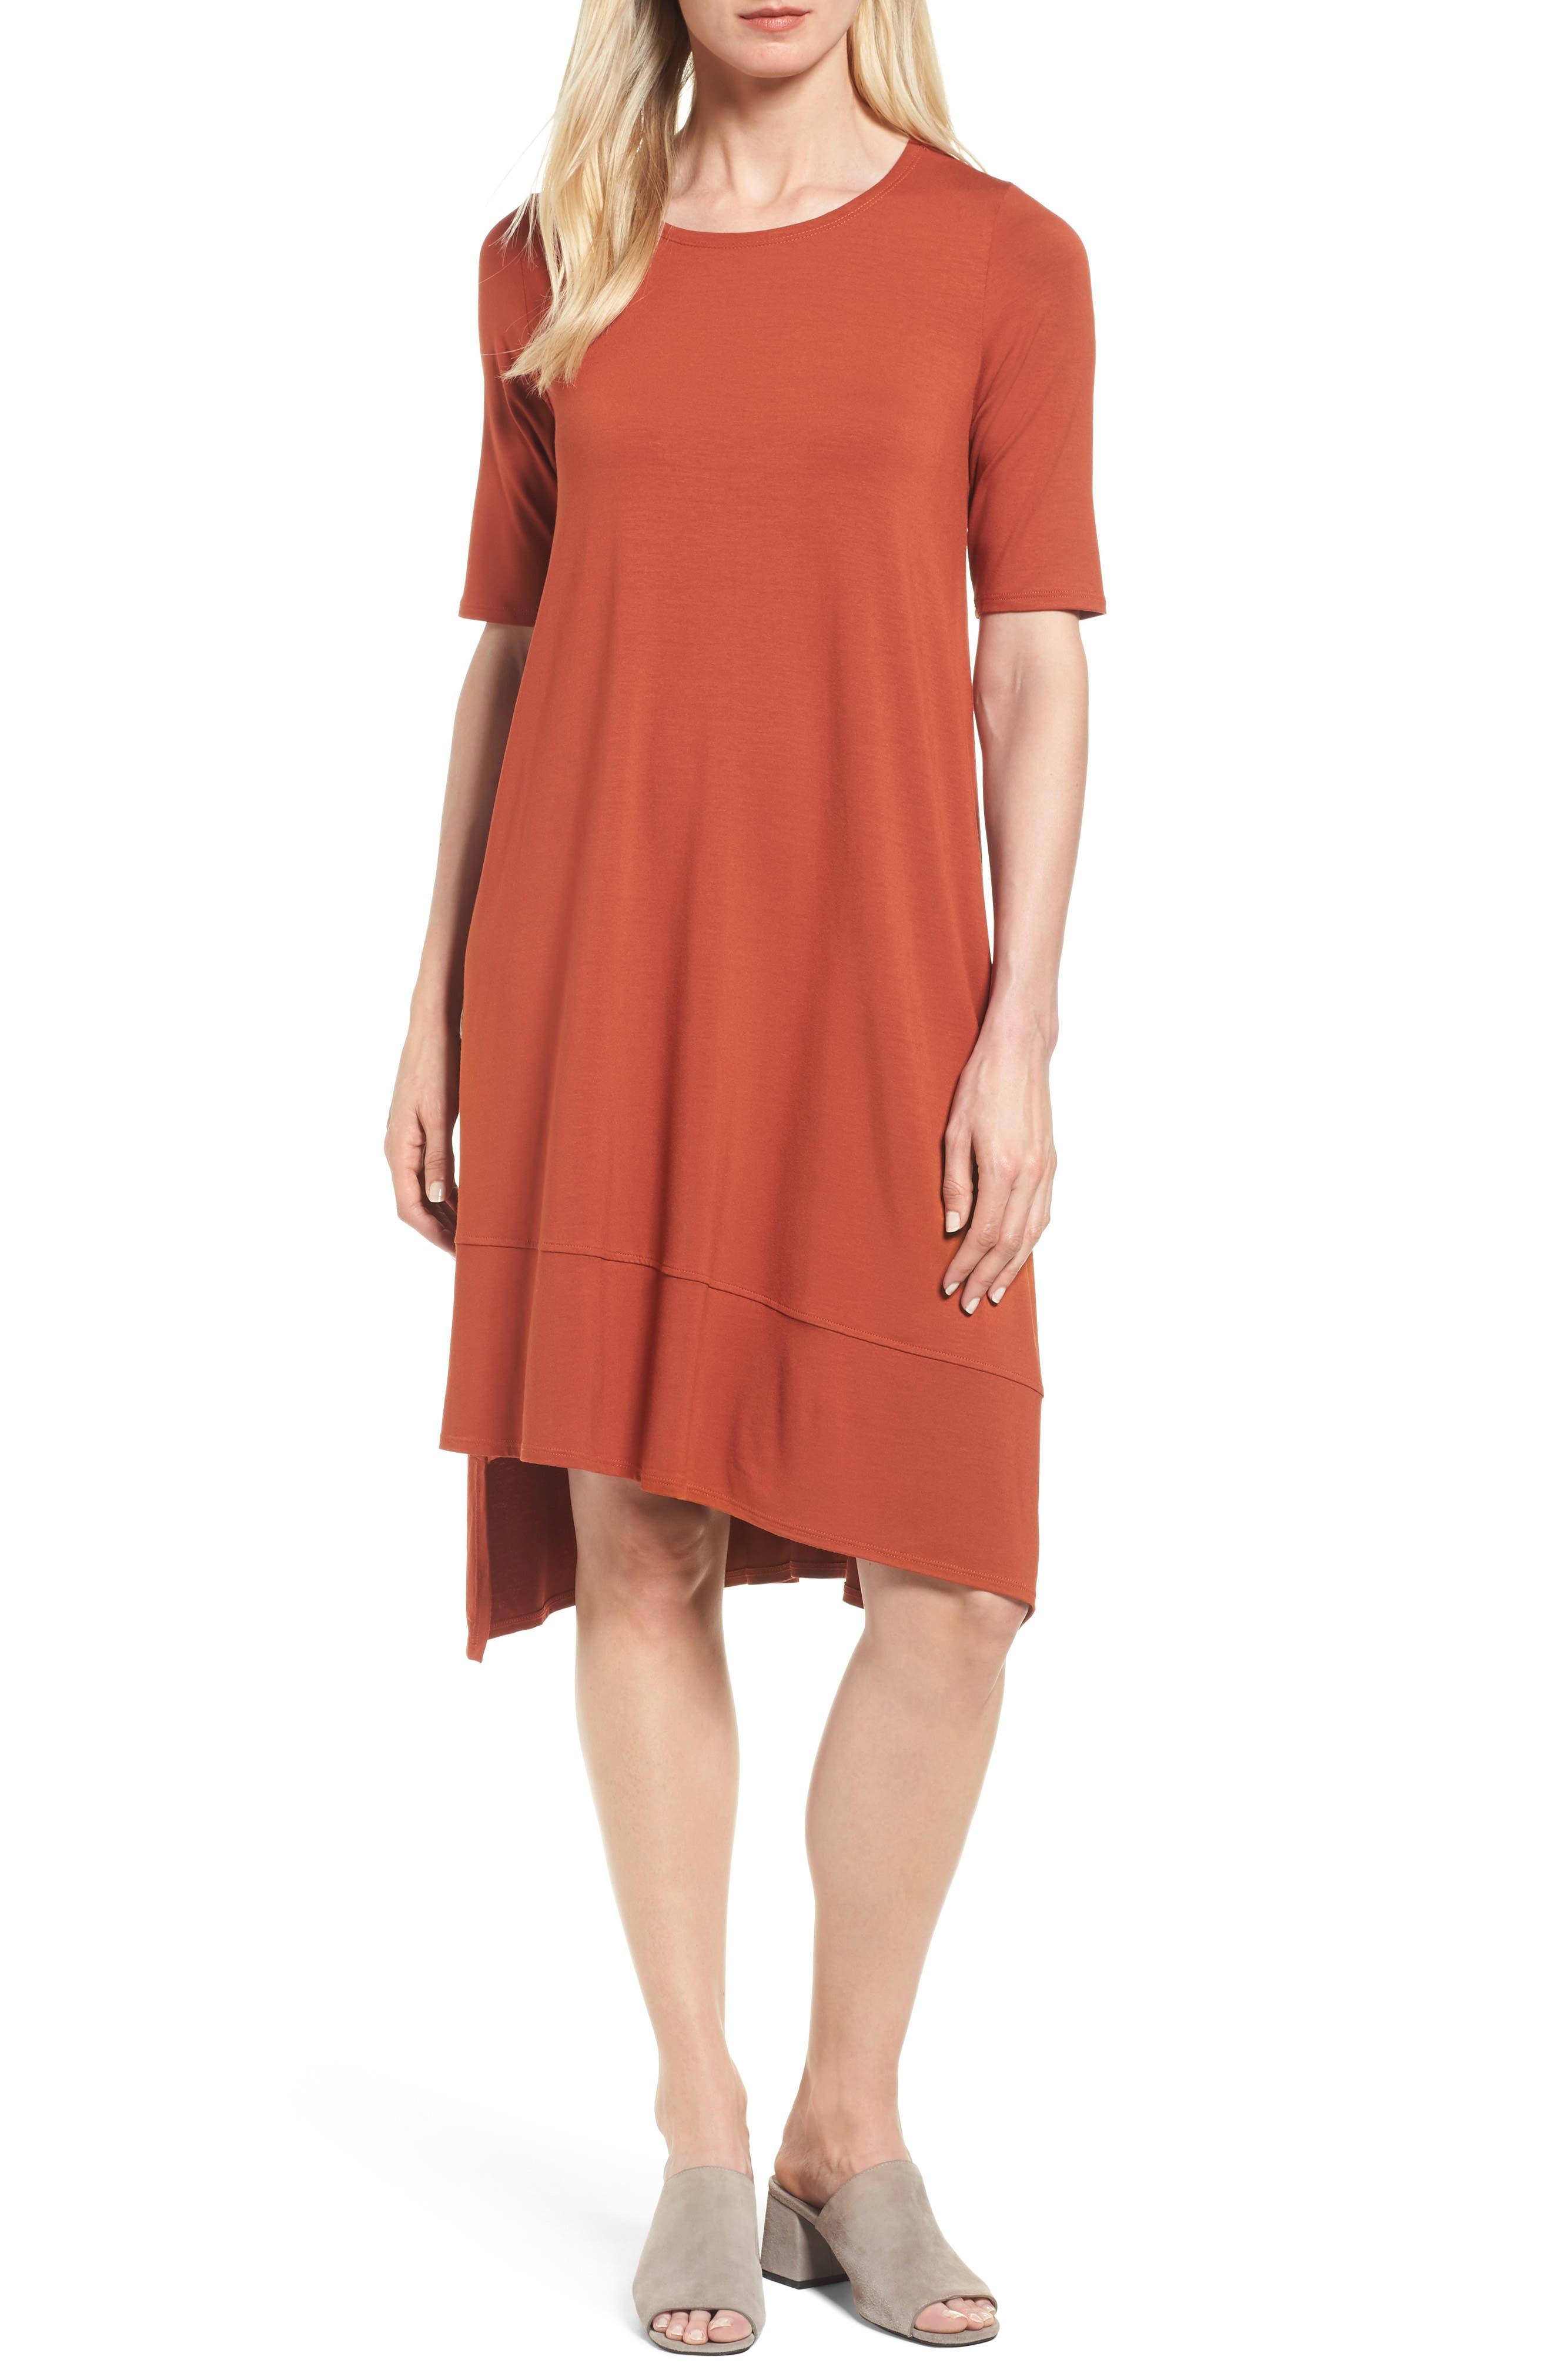 Alternate Image 1 Selected - Eileen Fisher Jersey Asymmetrical A-Line Dress